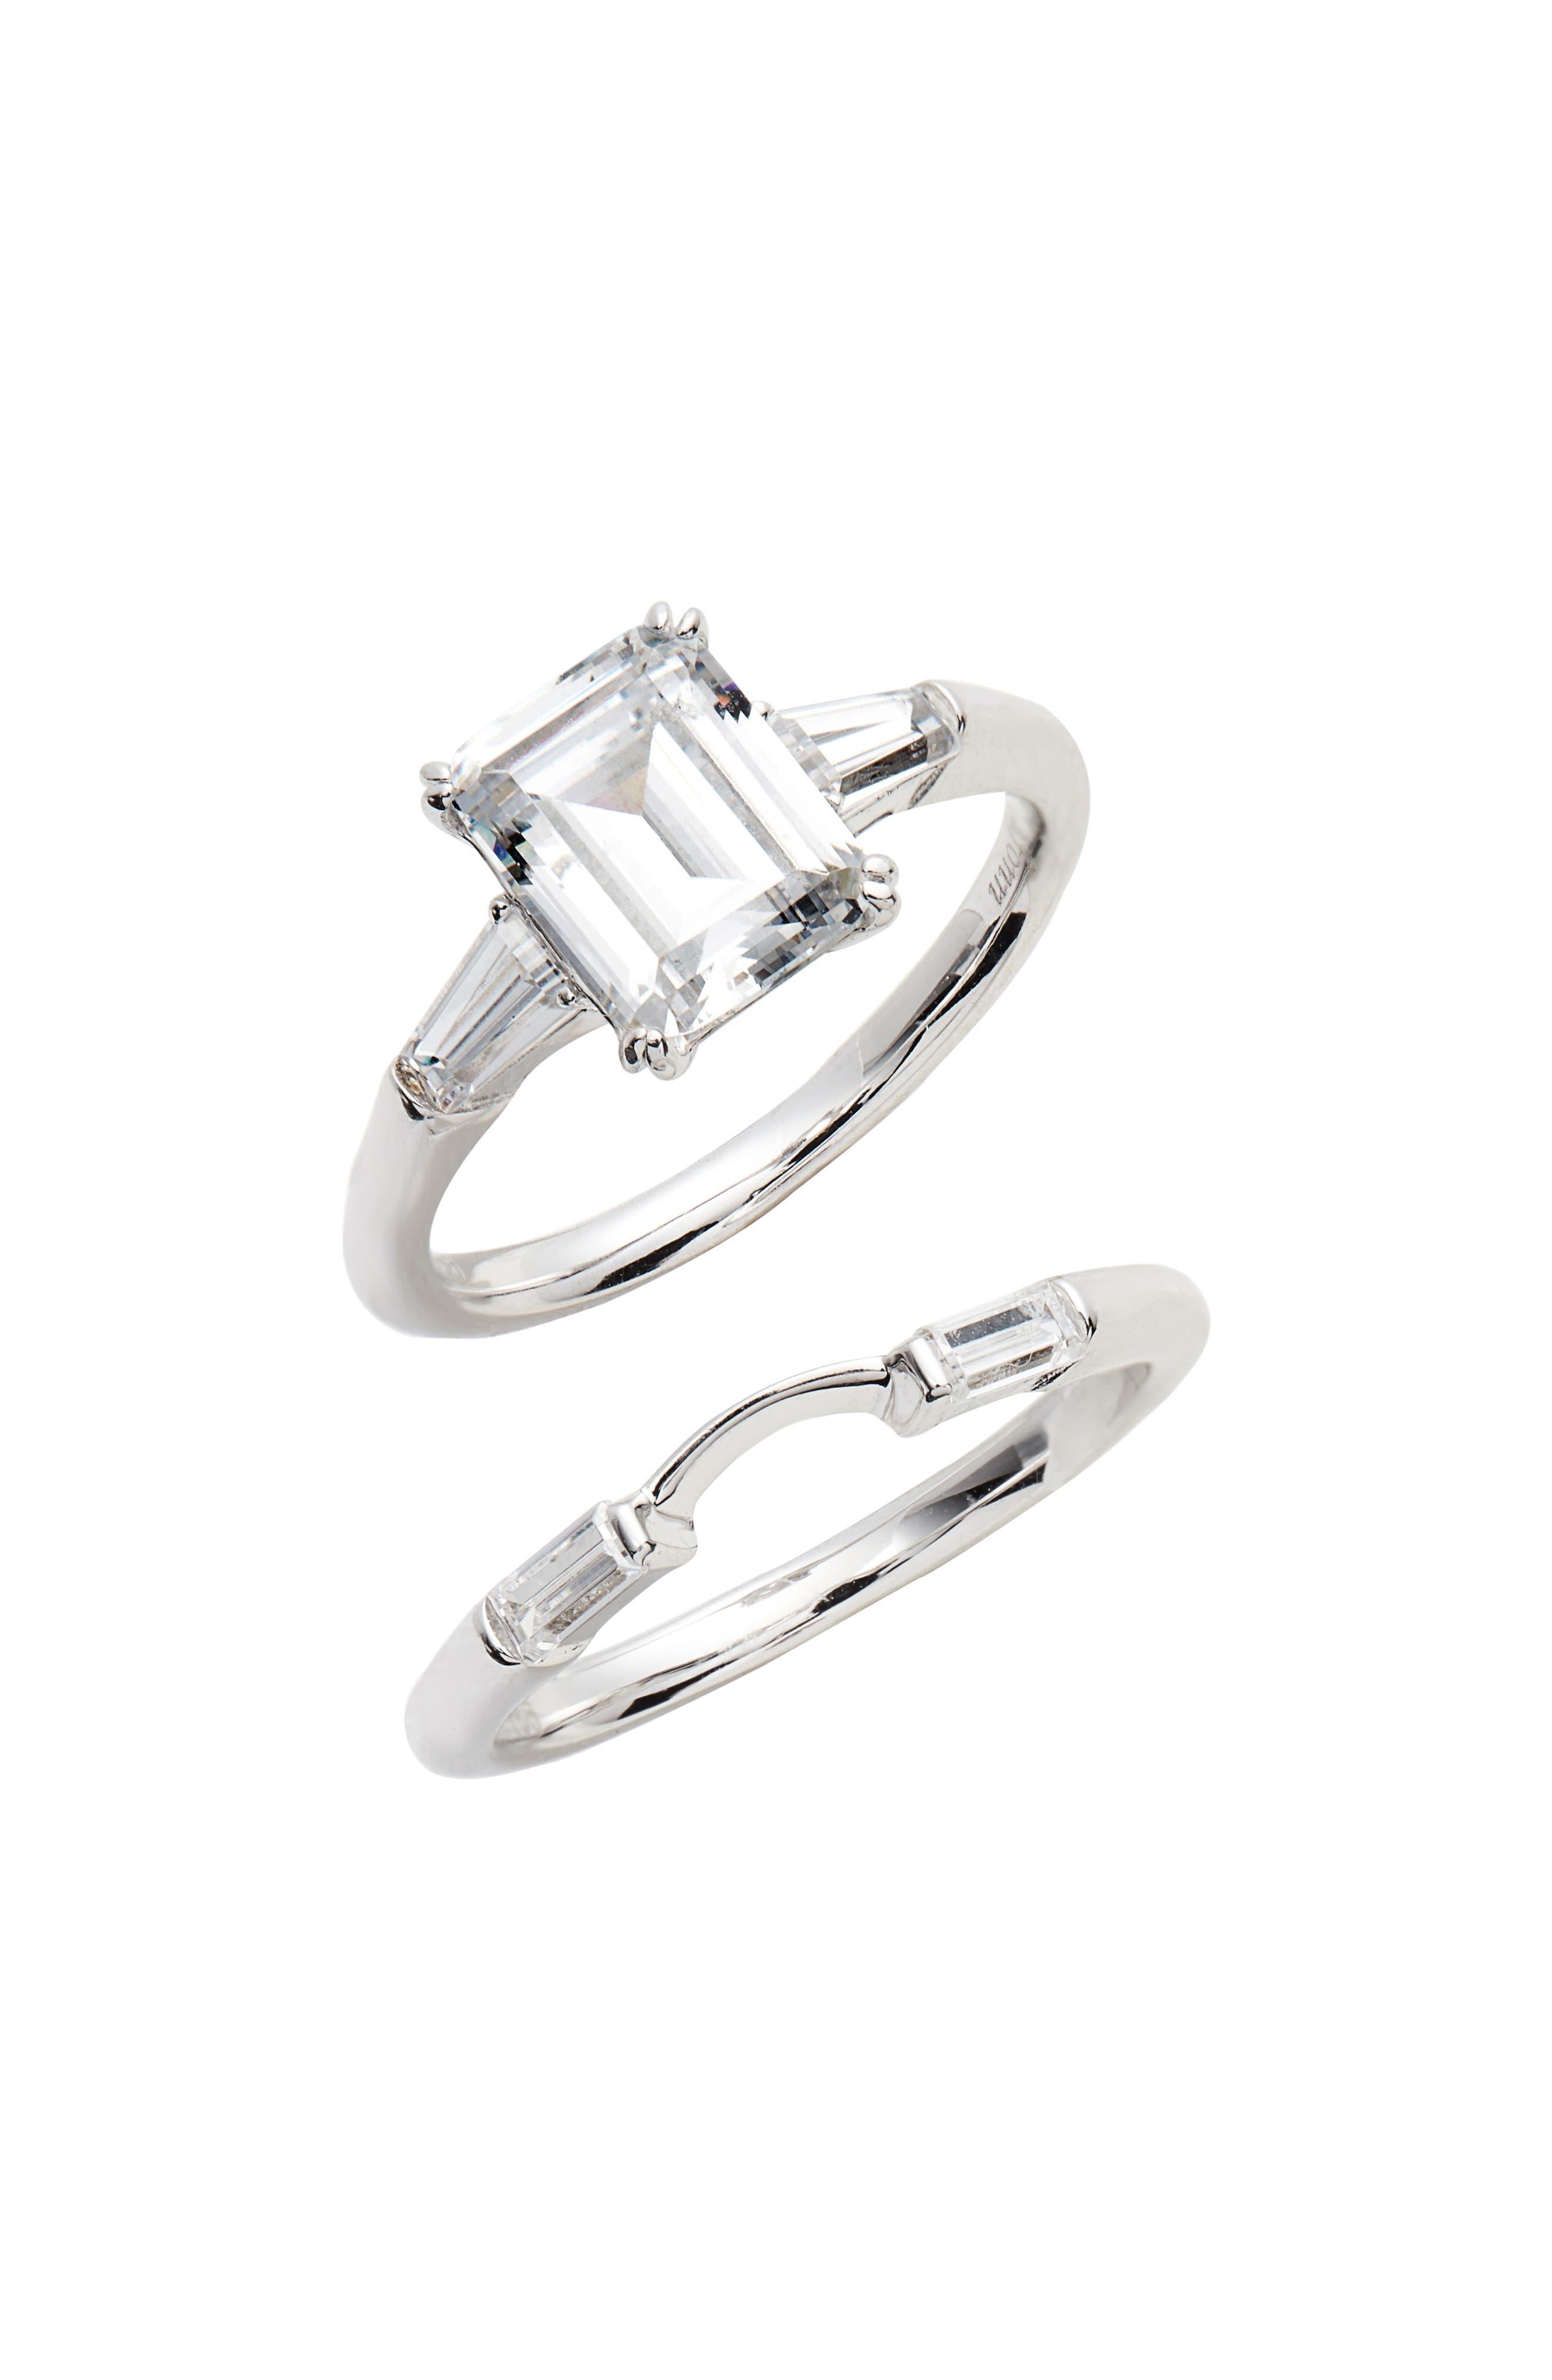 Emerald-Cut Ring